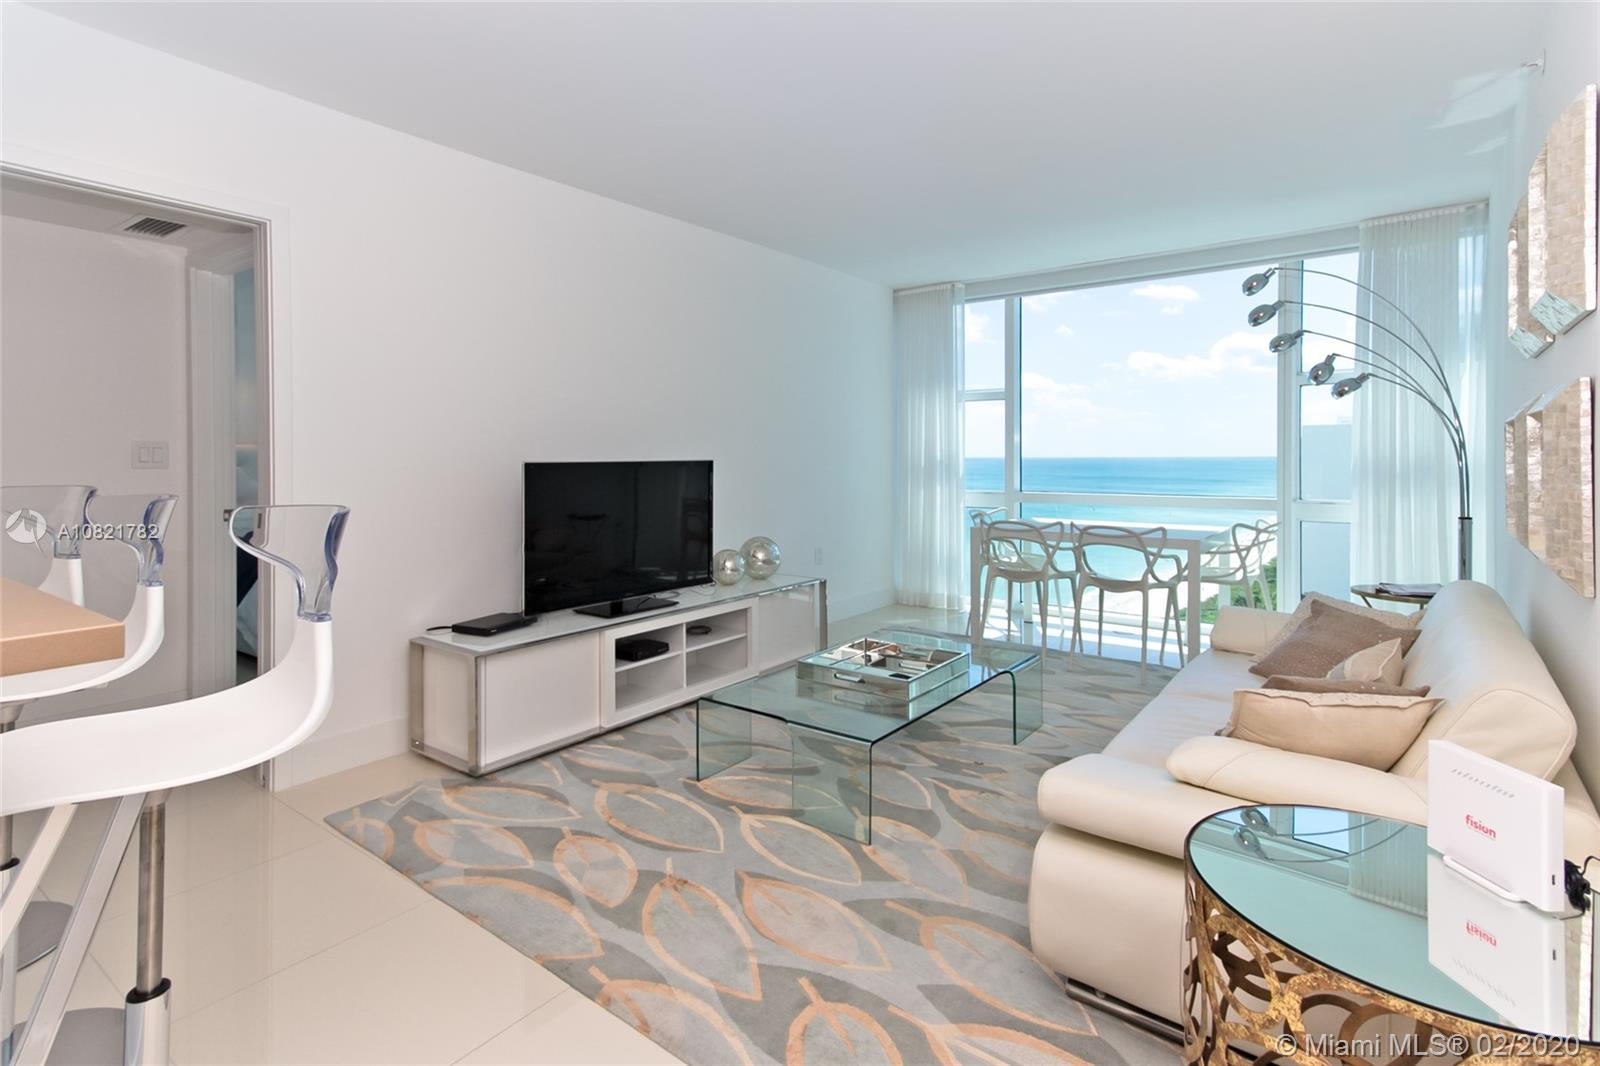 6801 Collins Ave, LPH14 - Miami Beach, Florida